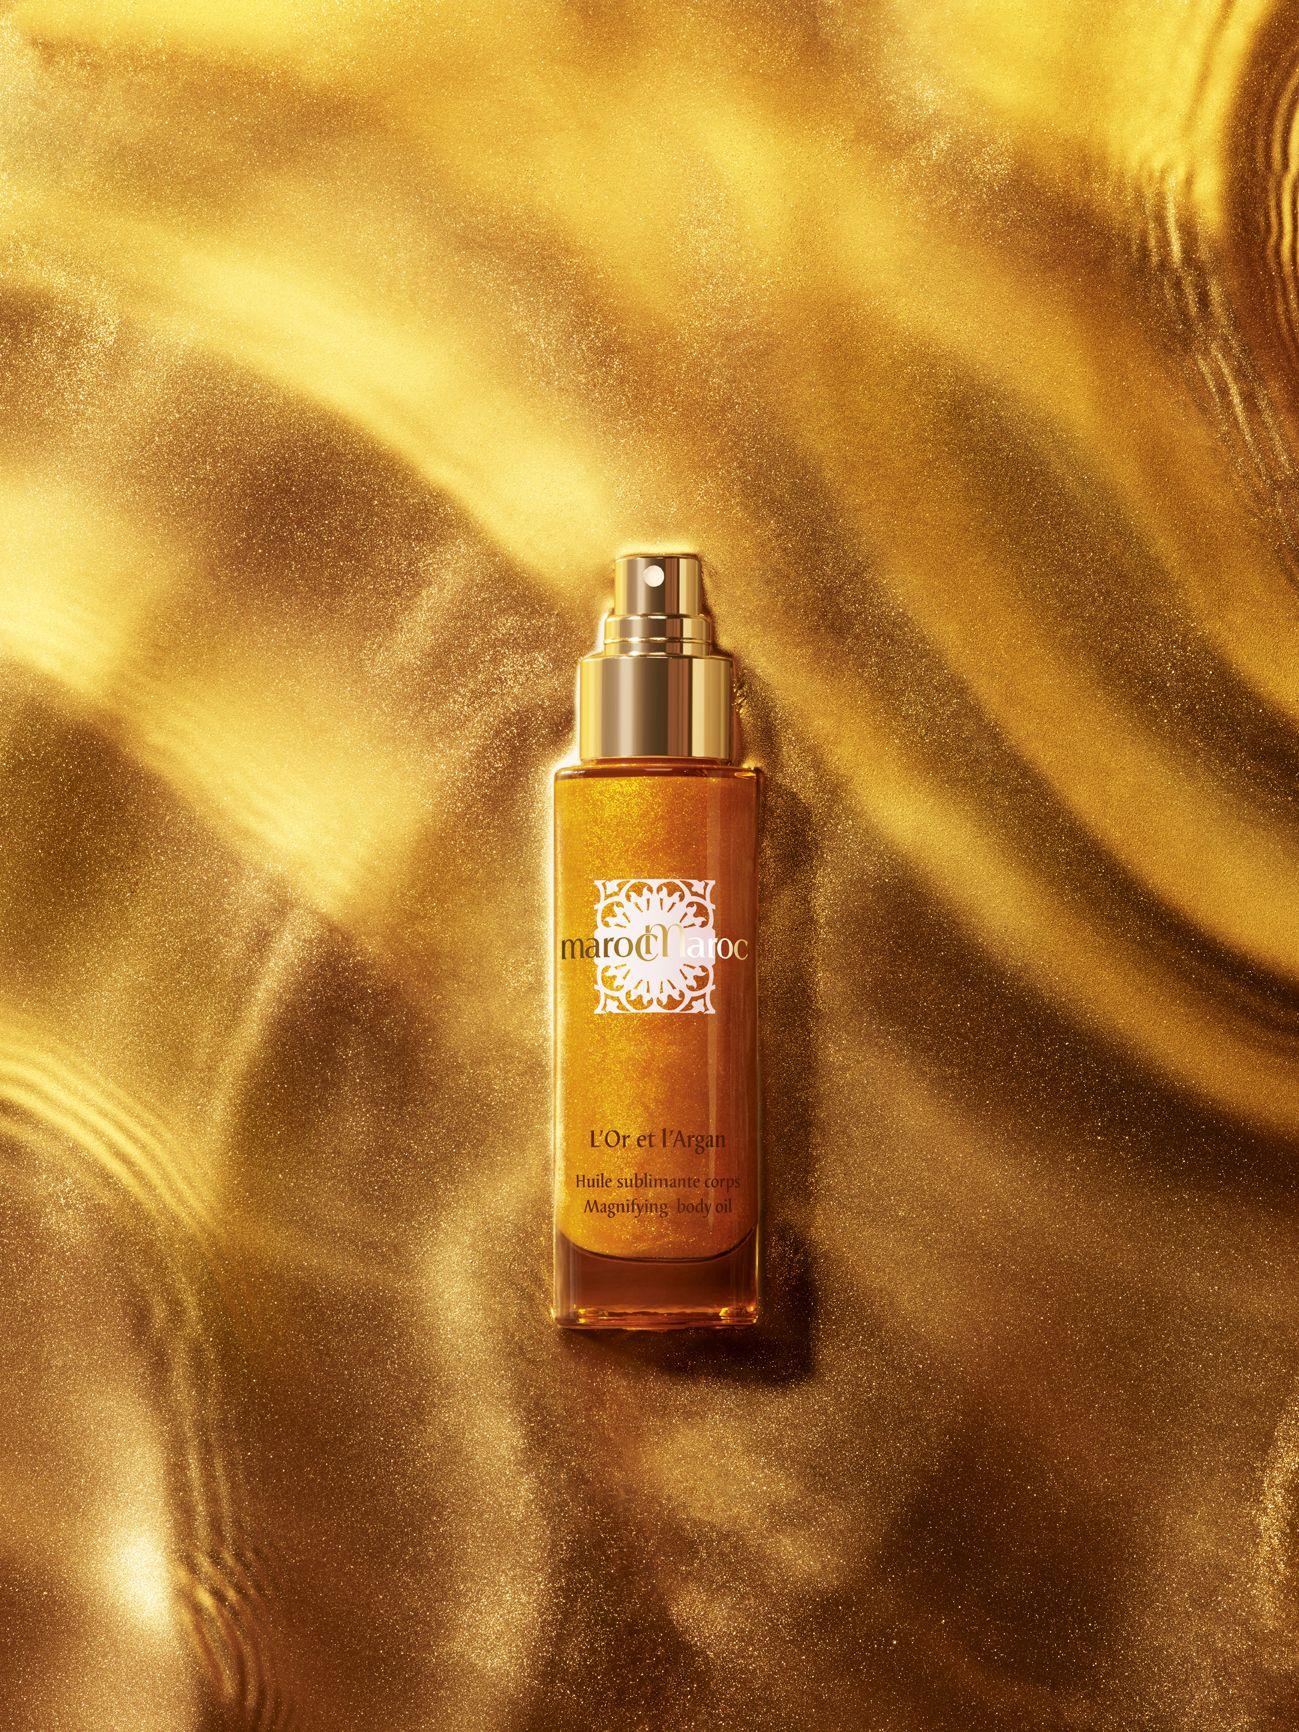 Texture Body Oil L'Or et l'Argan marocMaroc luxury cosmetics beauty skincare morocco spa